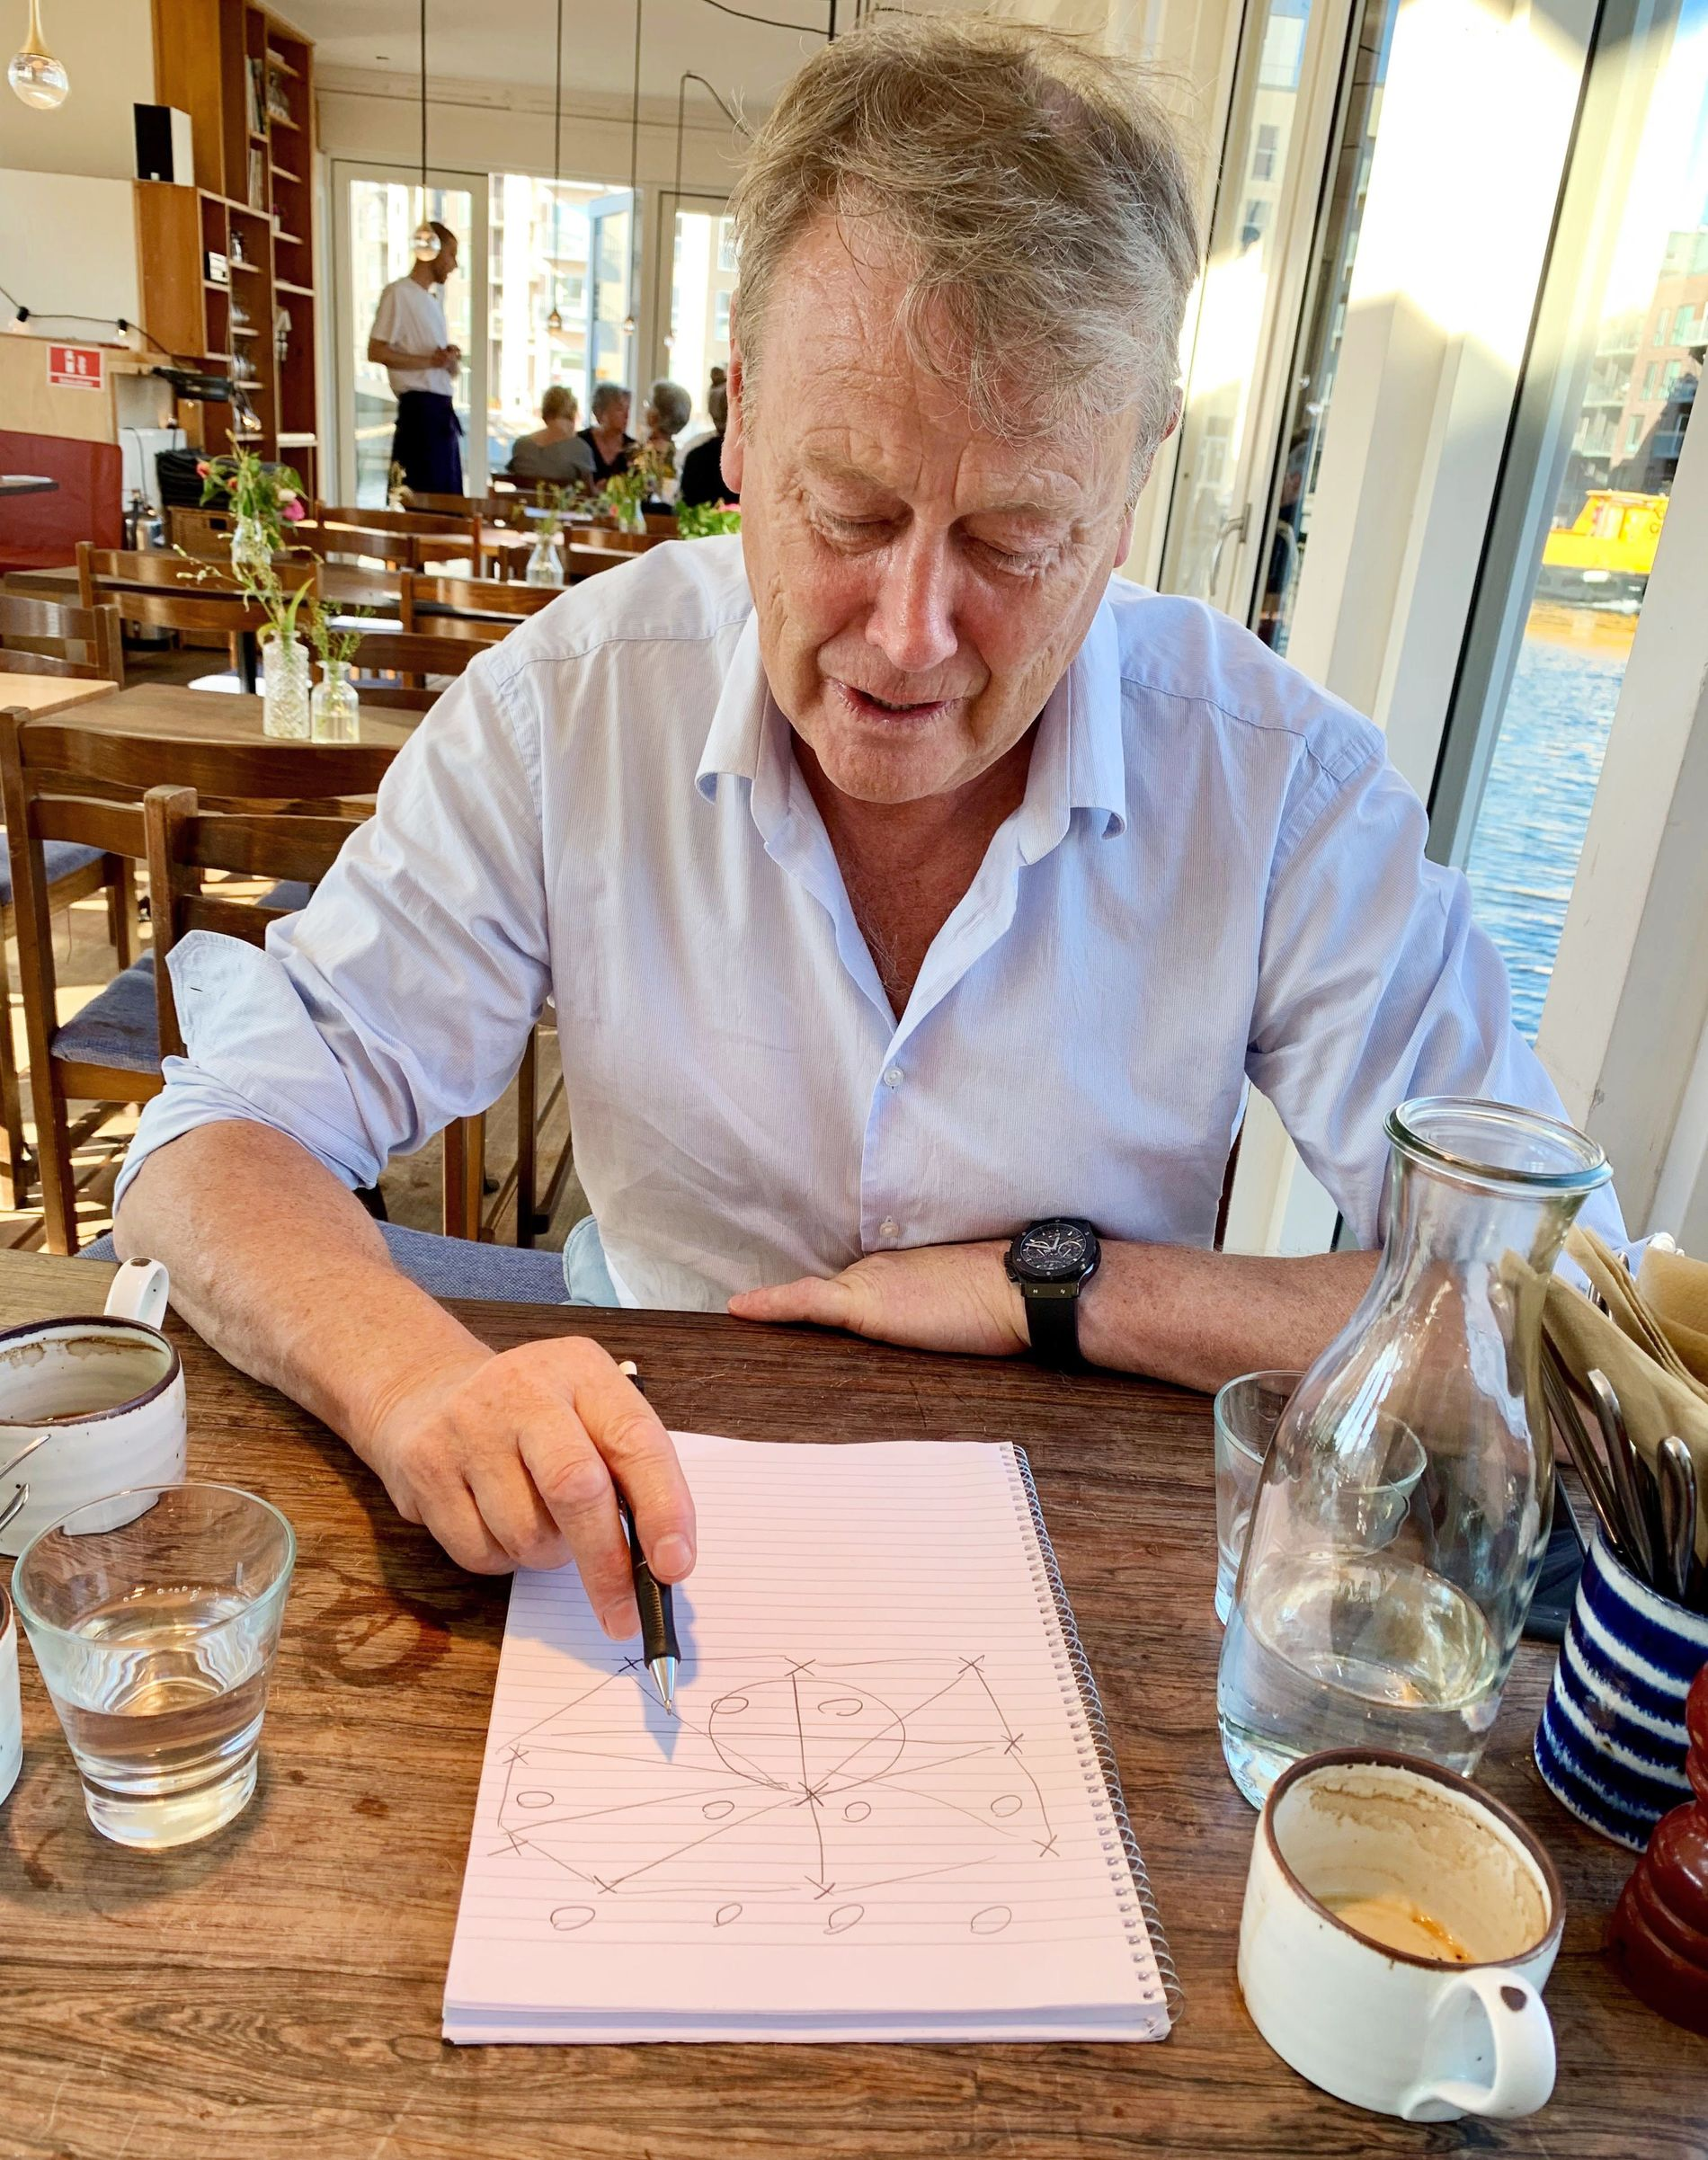 TEGNER: Åge Hareide forklarer VGs landslagskommentator hvordan det danske landslaget spiller fotball.